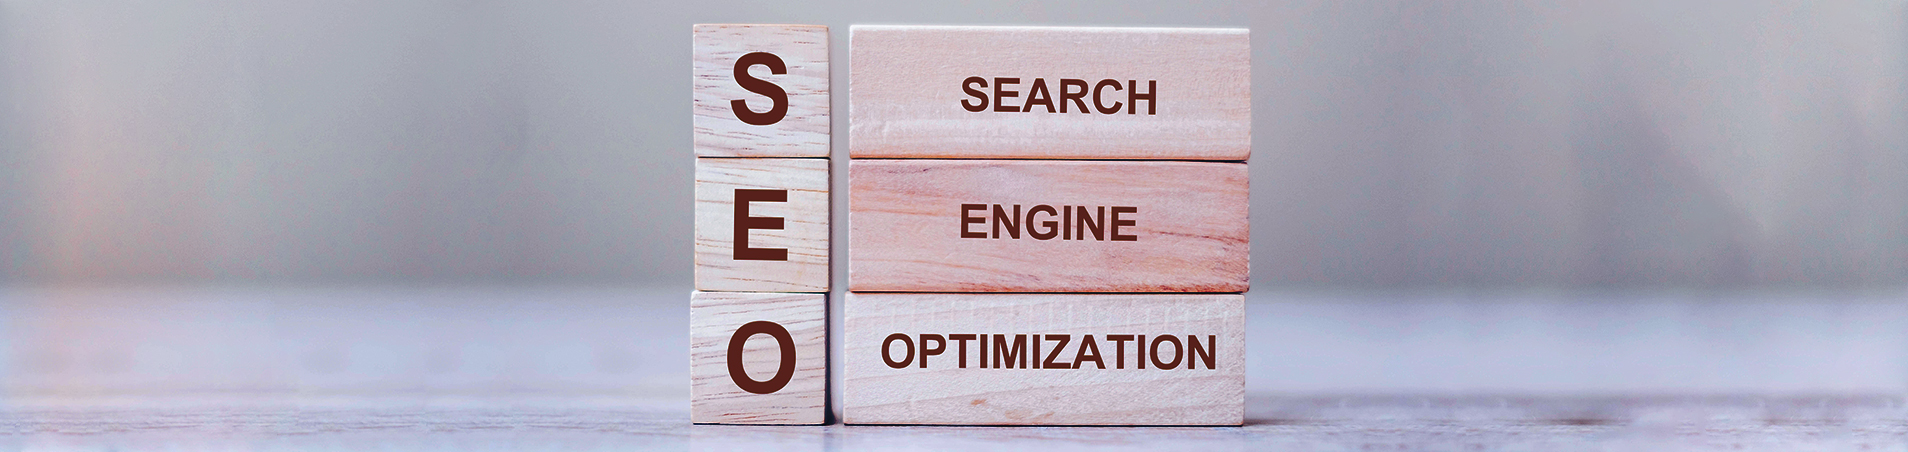 seo : Search Engine Optimisation